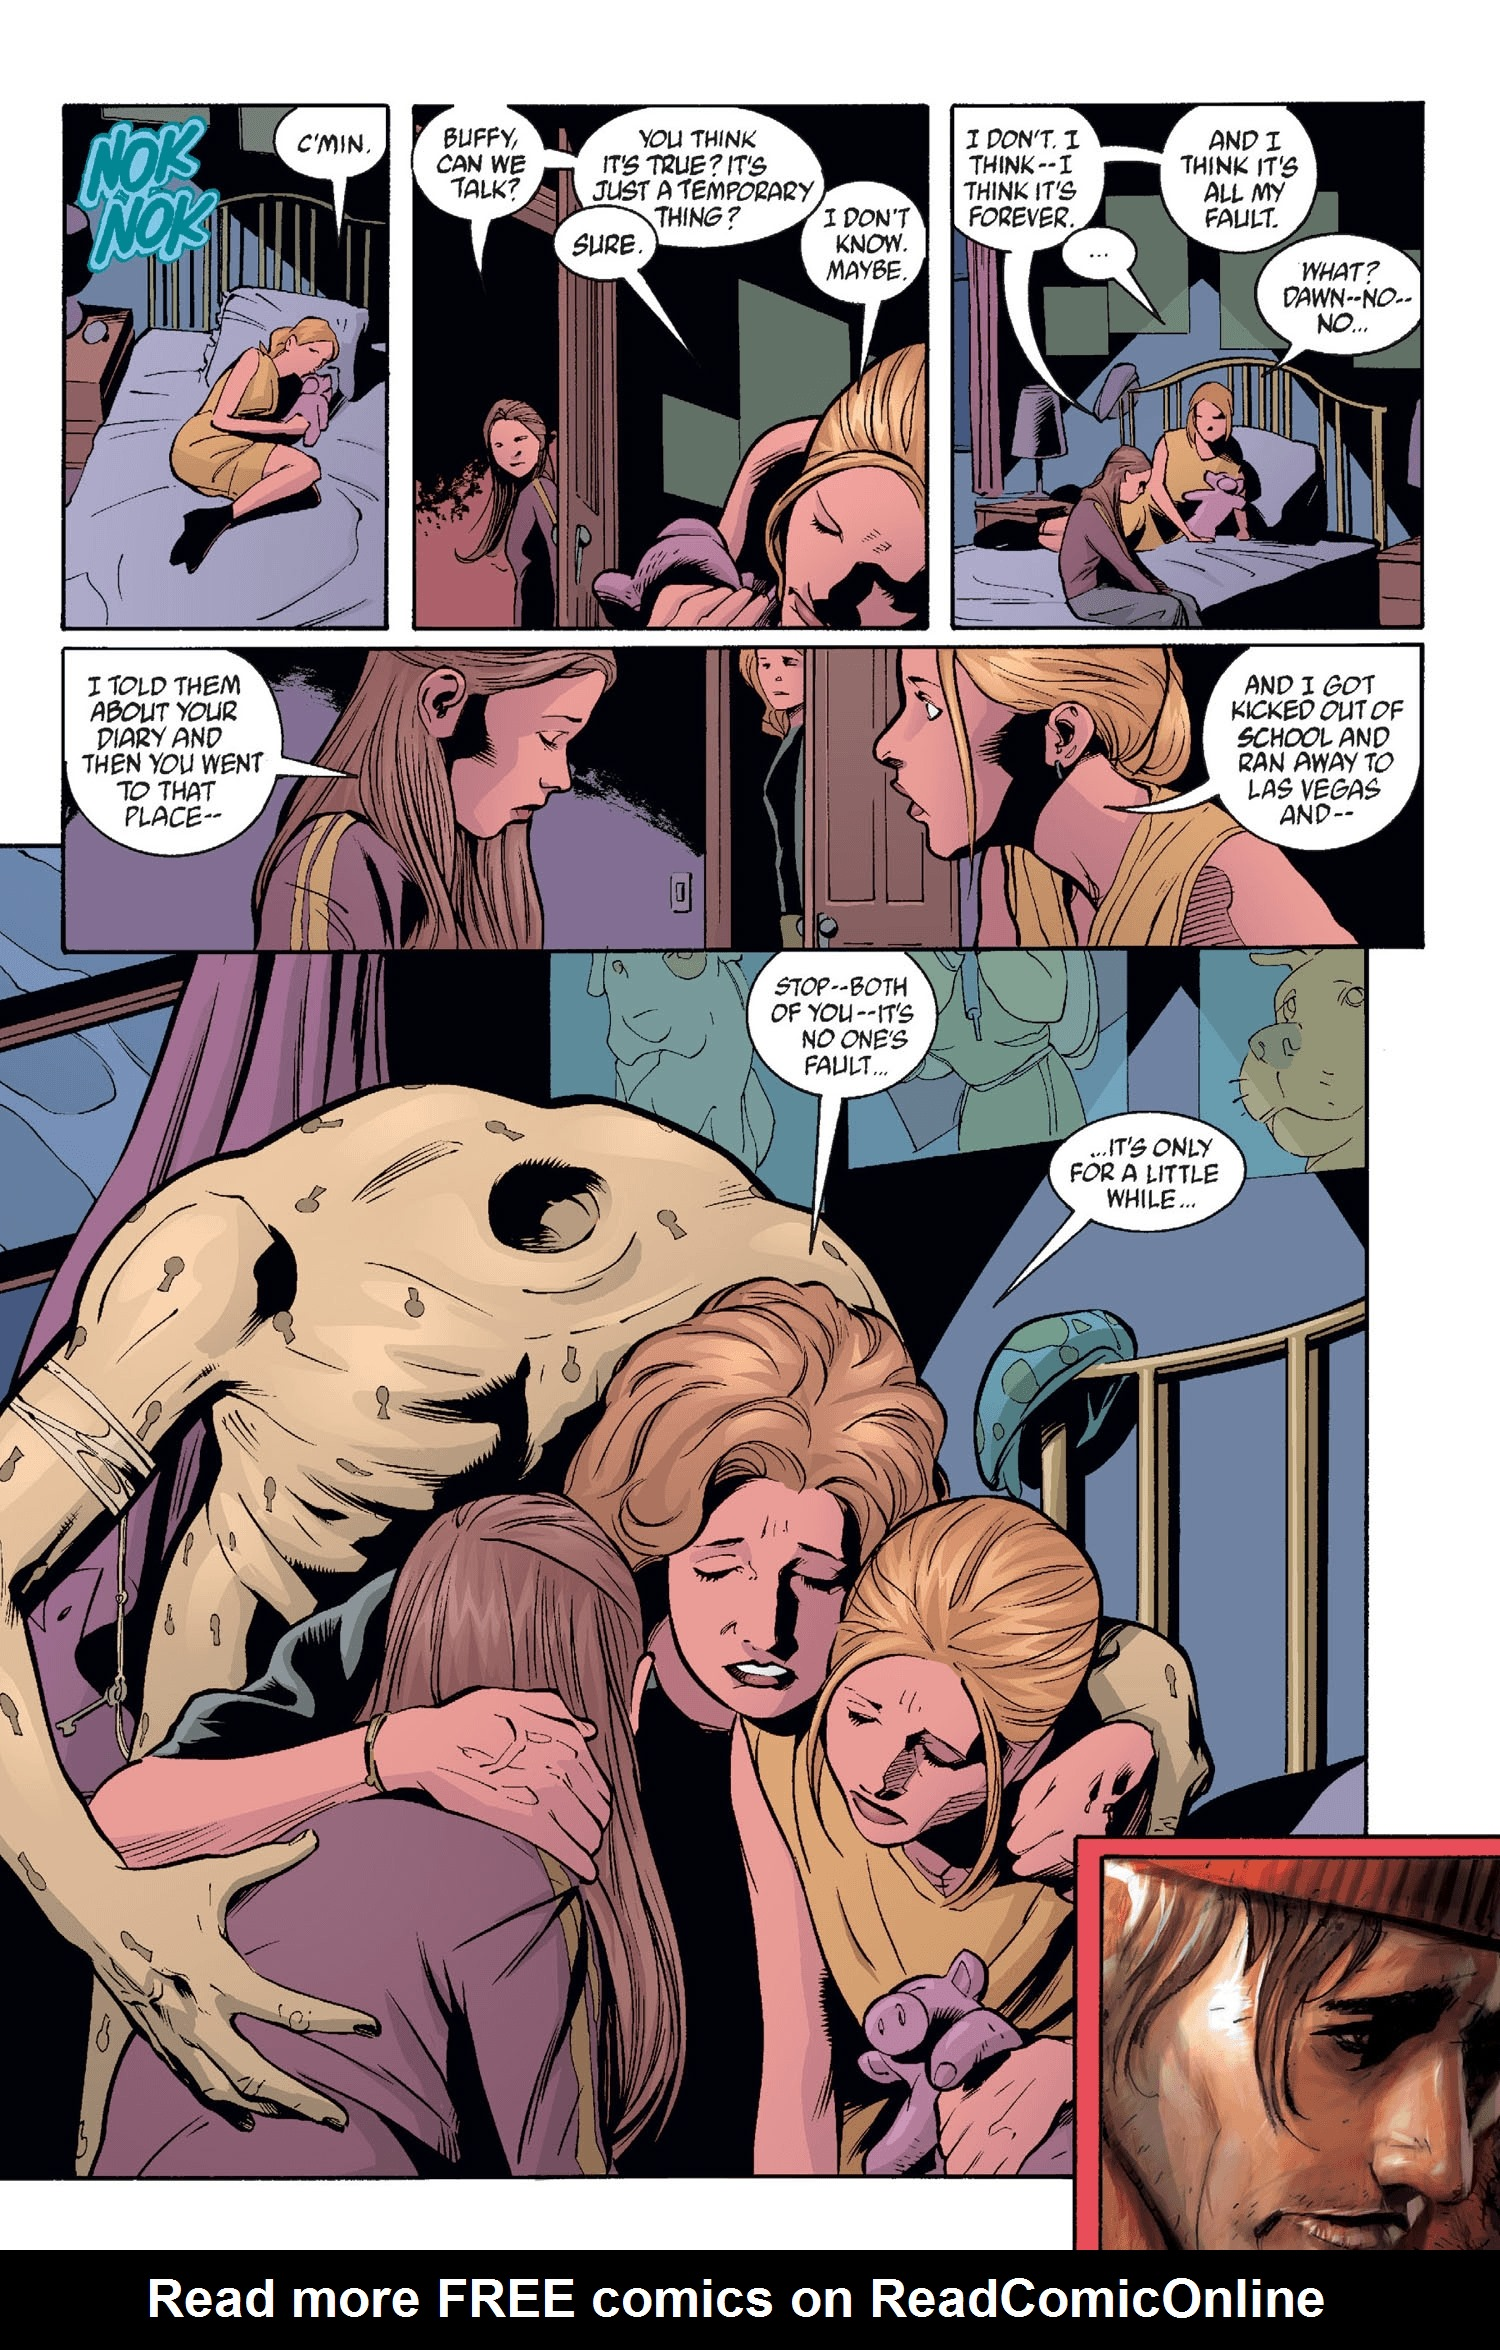 Read online Buffy the Vampire Slayer: Omnibus comic -  Issue # TPB 2 - 45